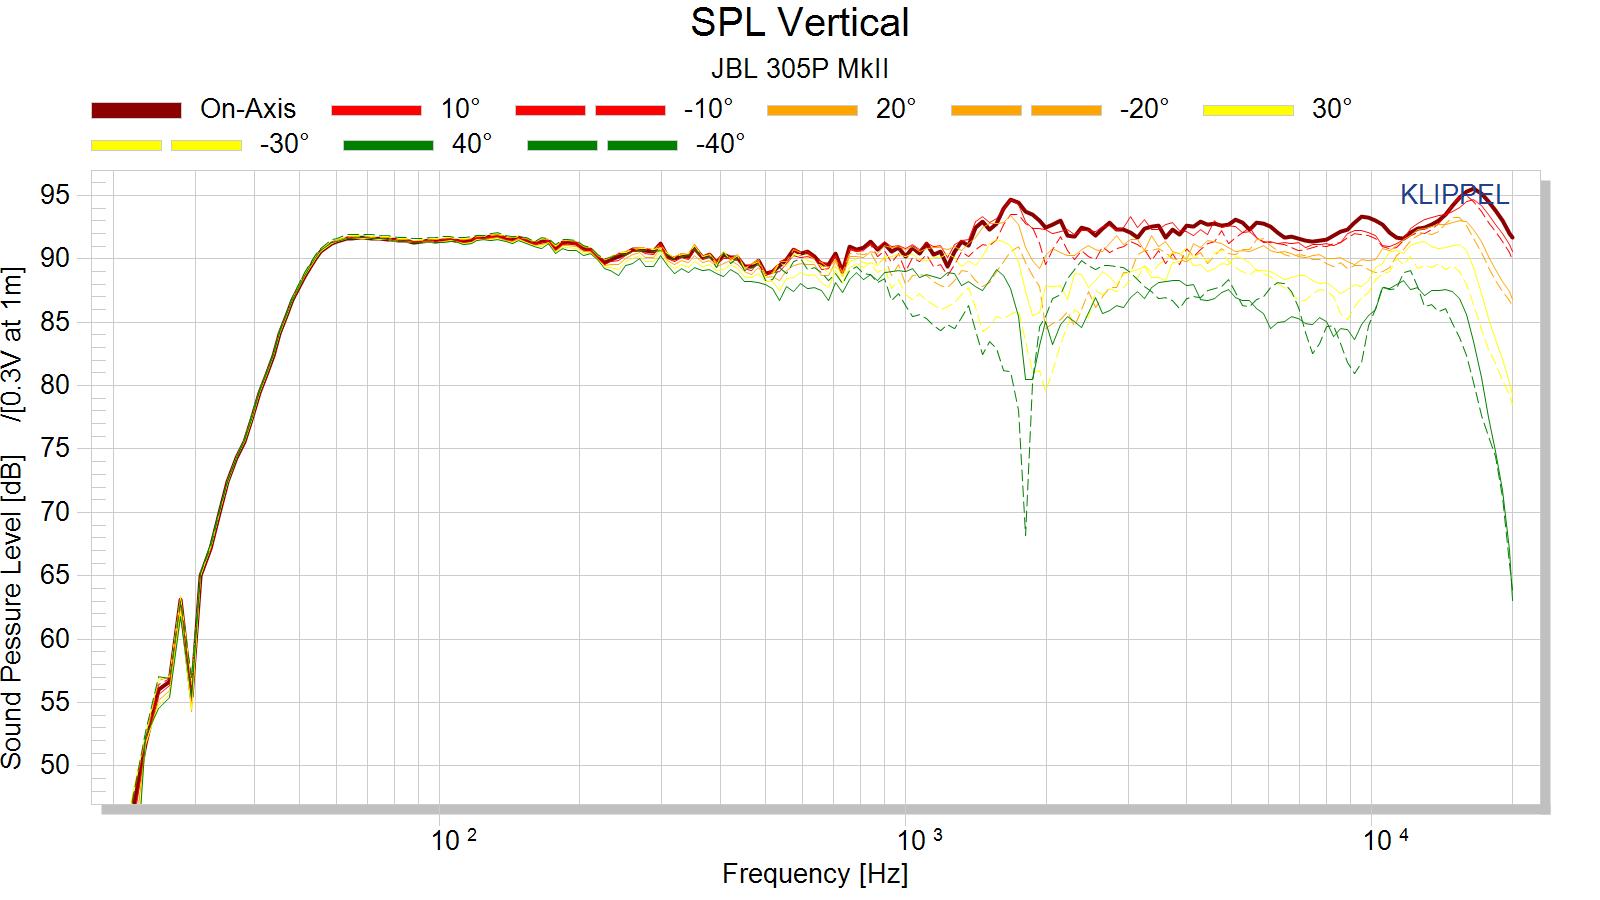 SPL%20Vertical.png